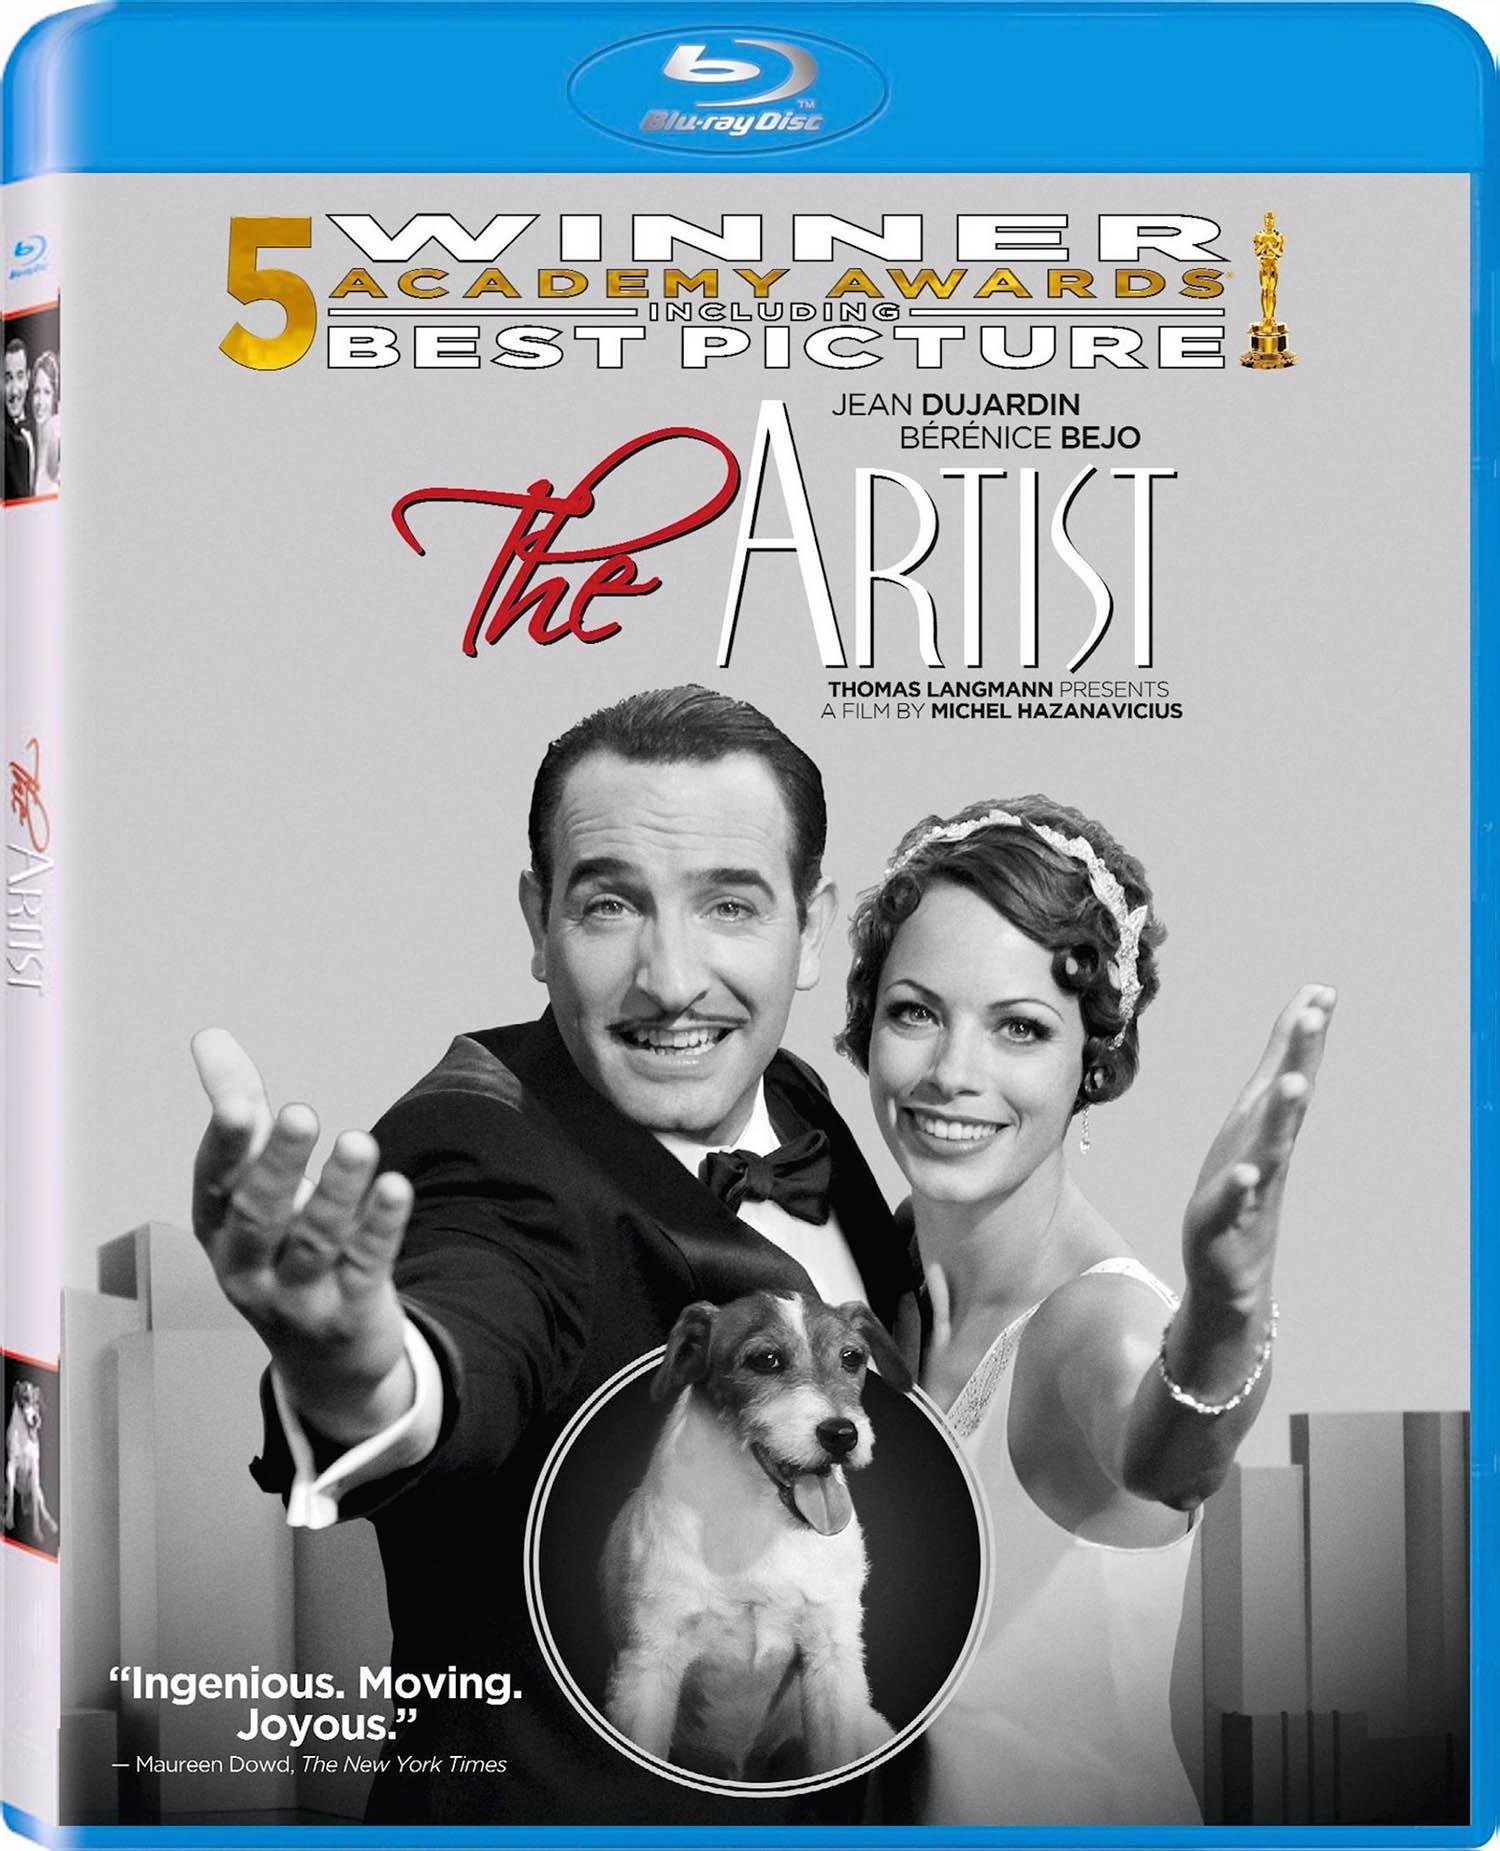 cfa06f9a764a Blu-ray Review  The Artist - Slant Magazine